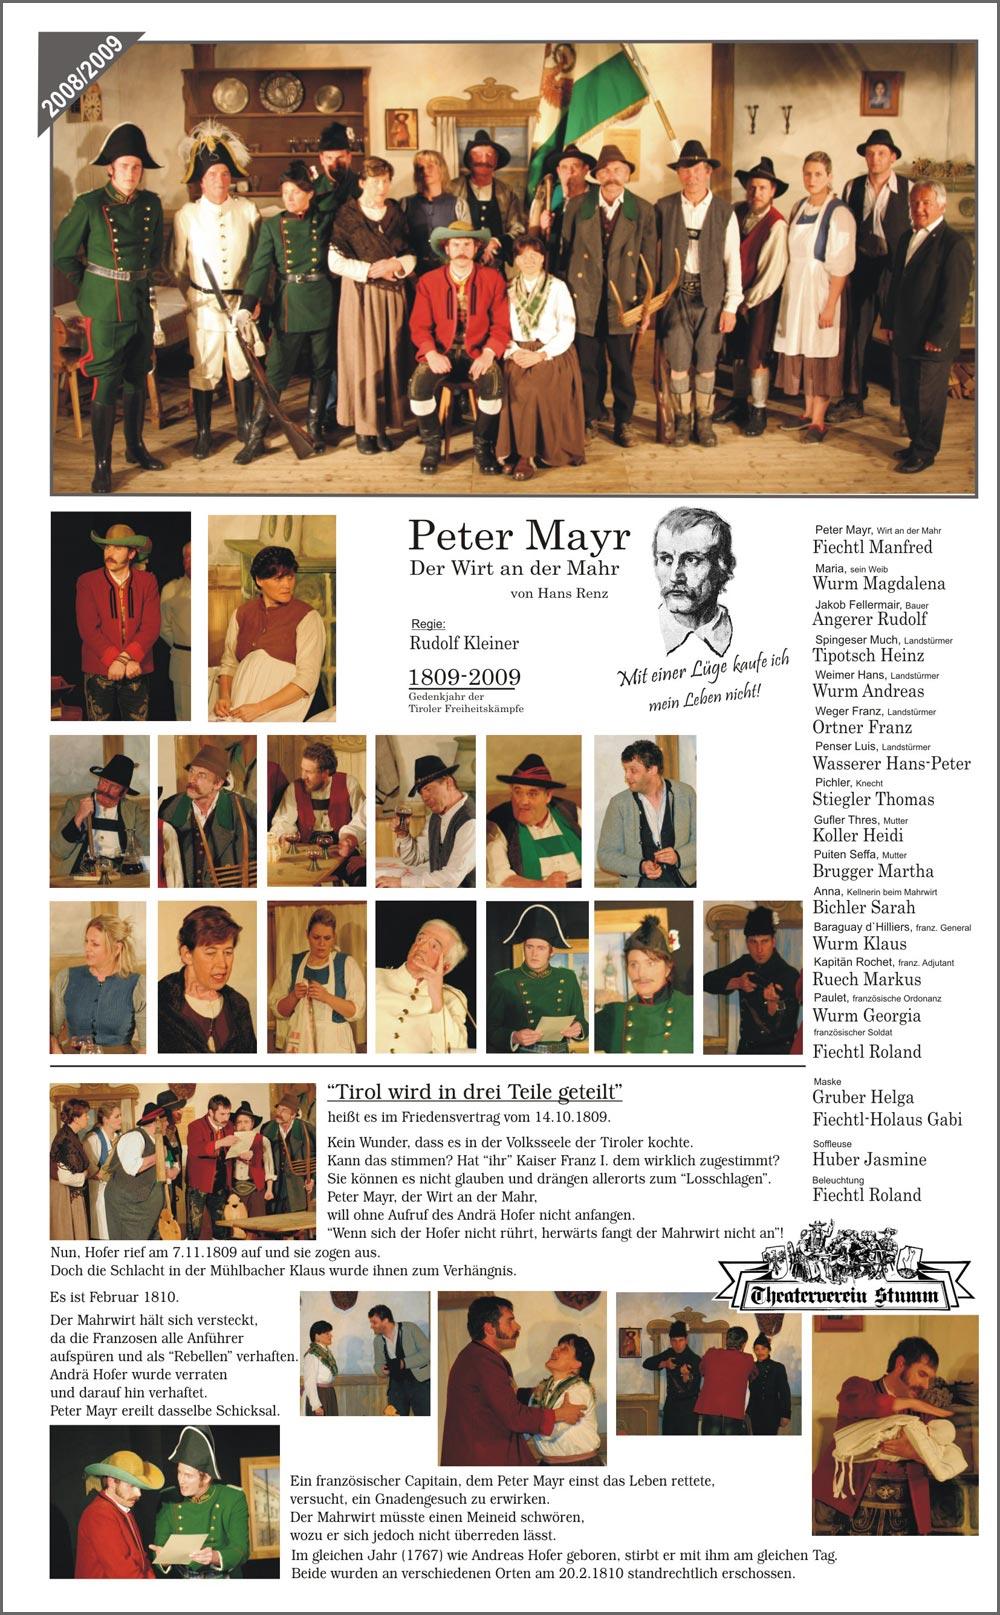 2008 Peter Mayr